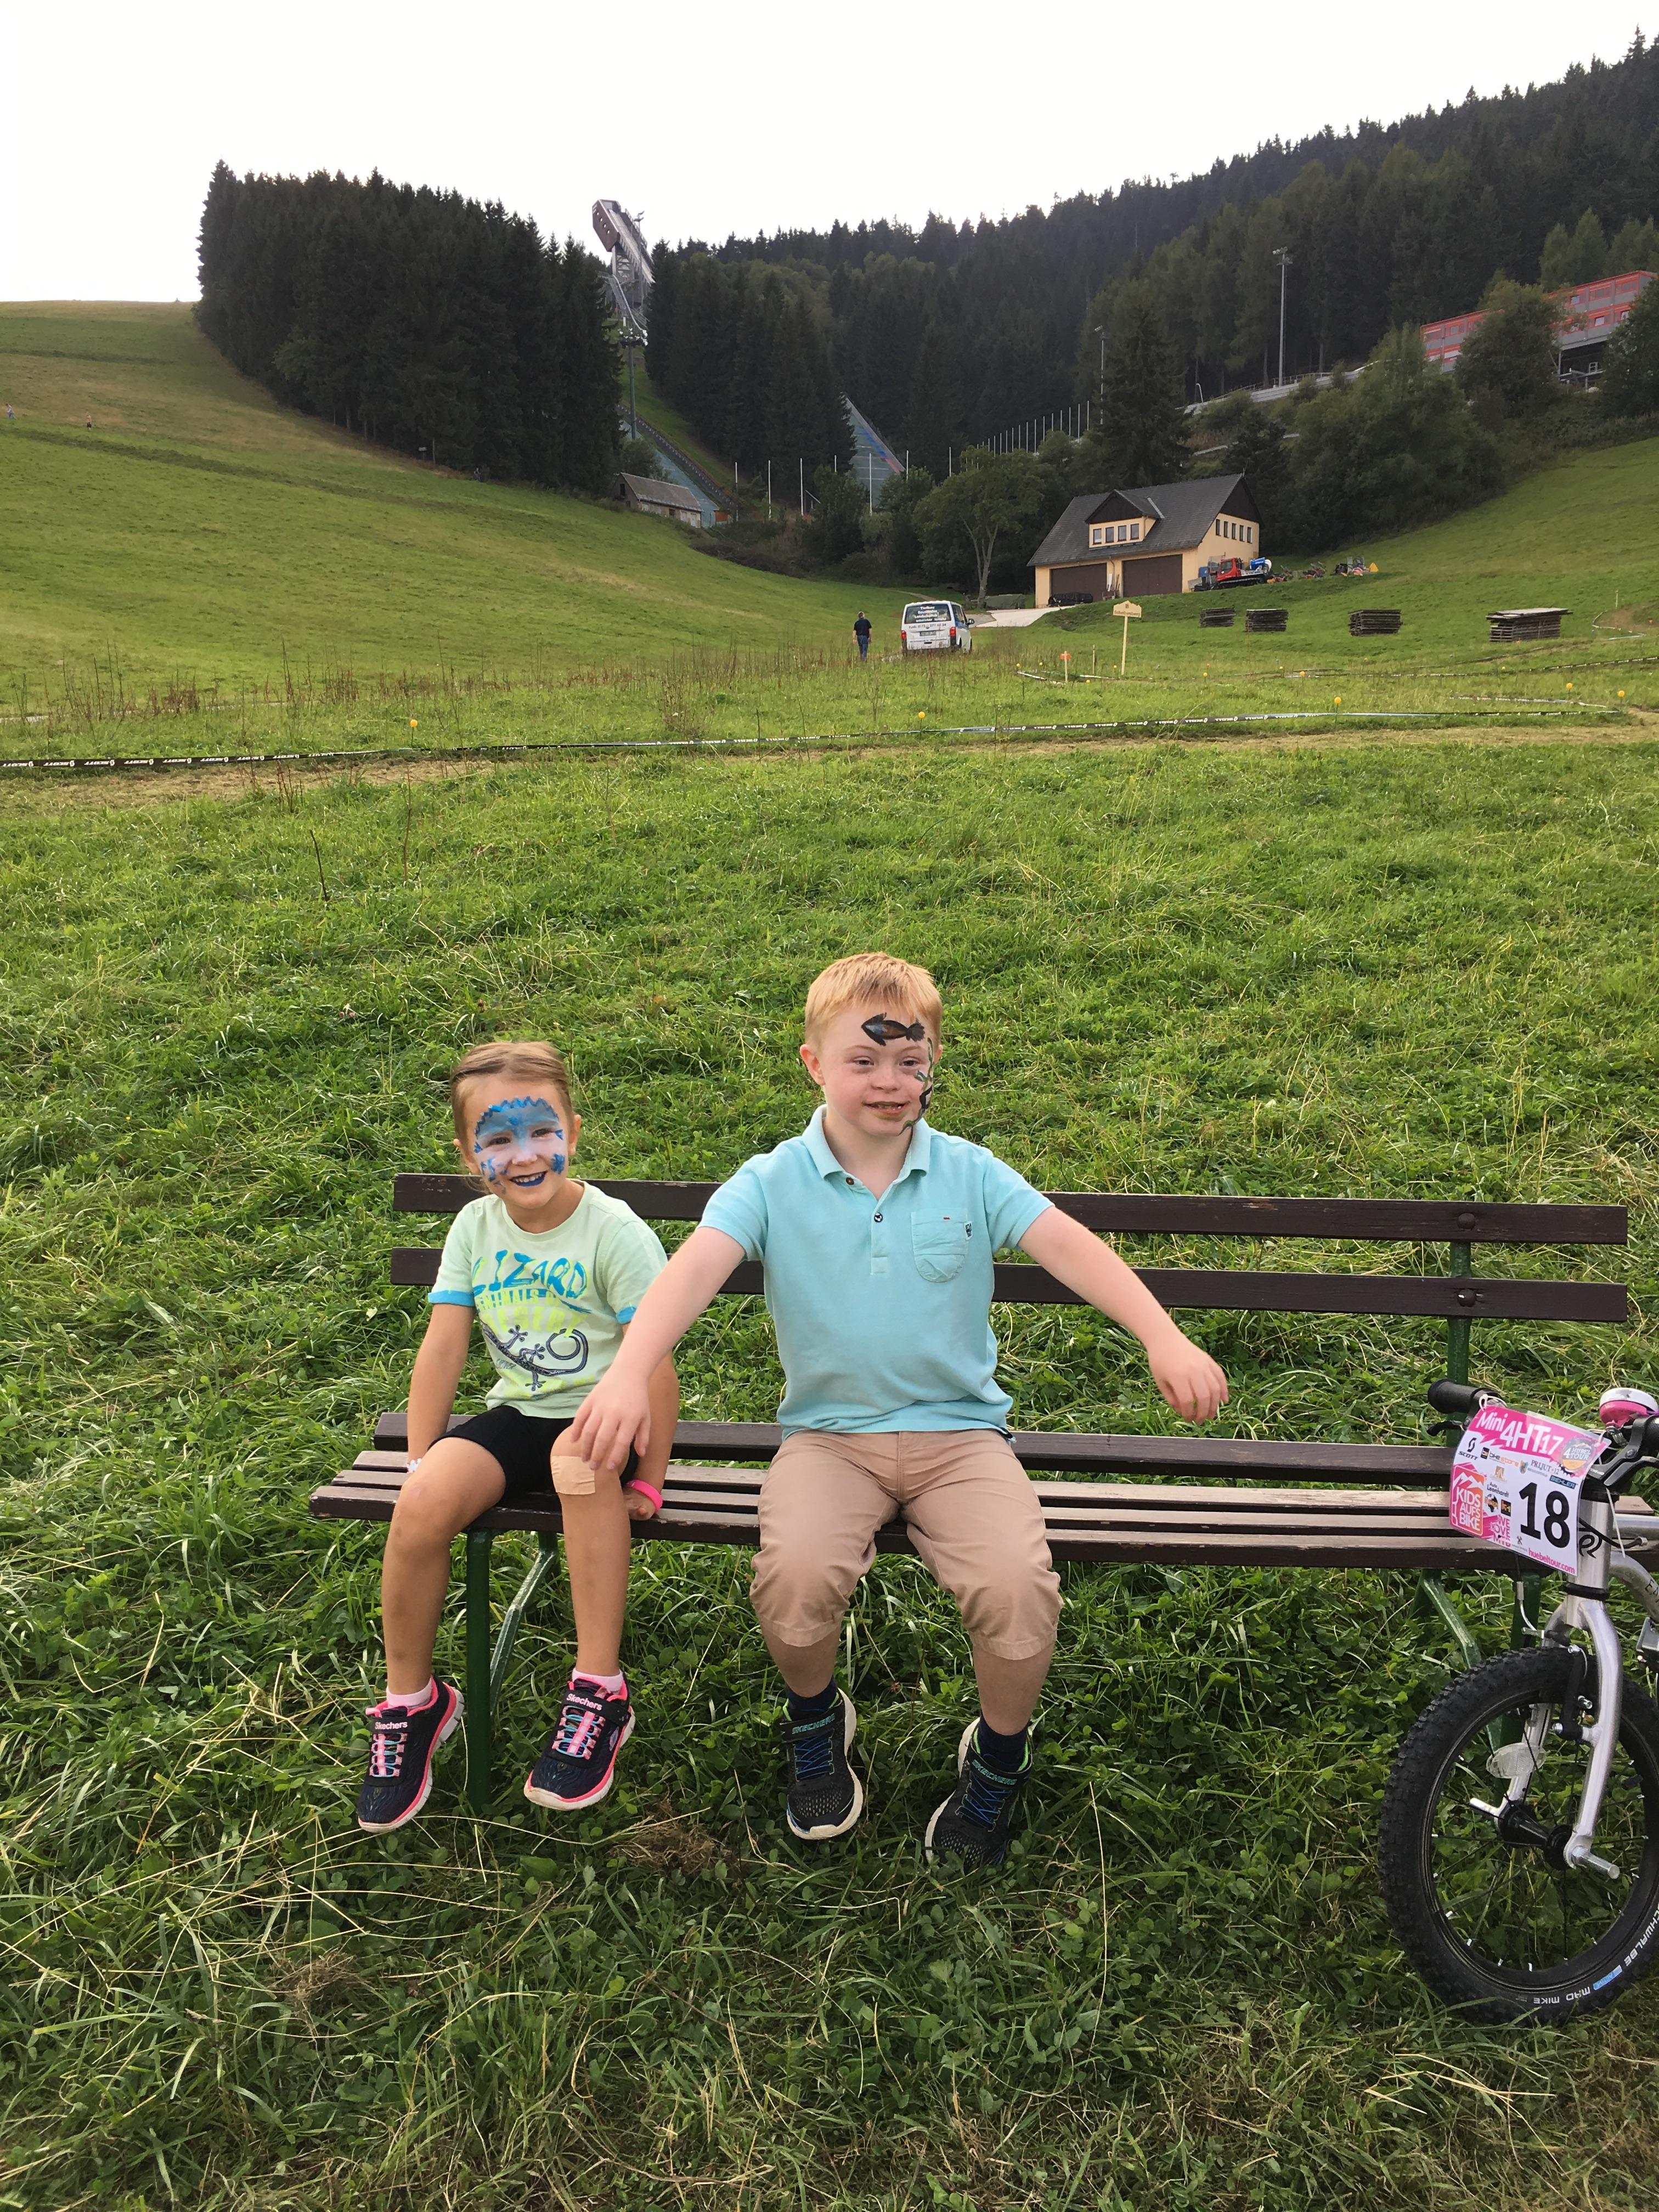 Mini-Hübel-Touristin Suvi Milena Schubert und Cousin Niklas Scheller.